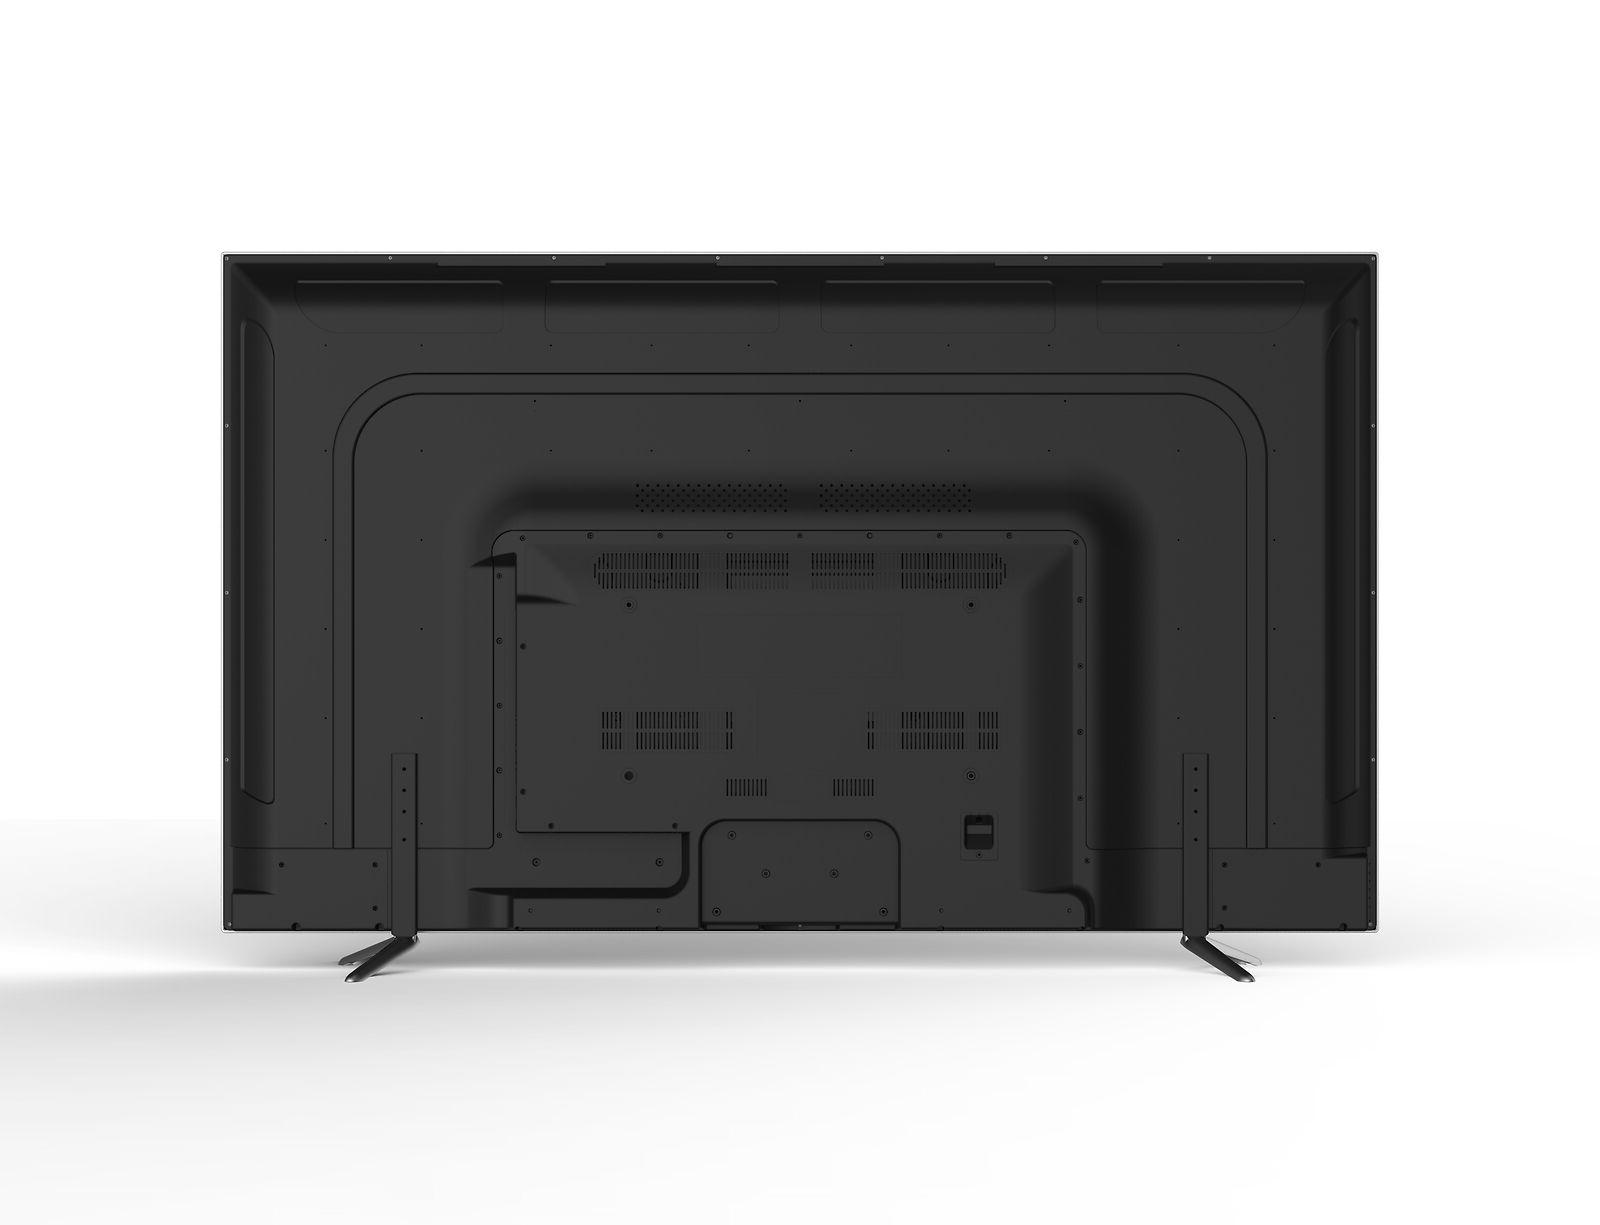 Polaroid inch LED Smart TV HDR 3 HDMI Ultra HD NoTax